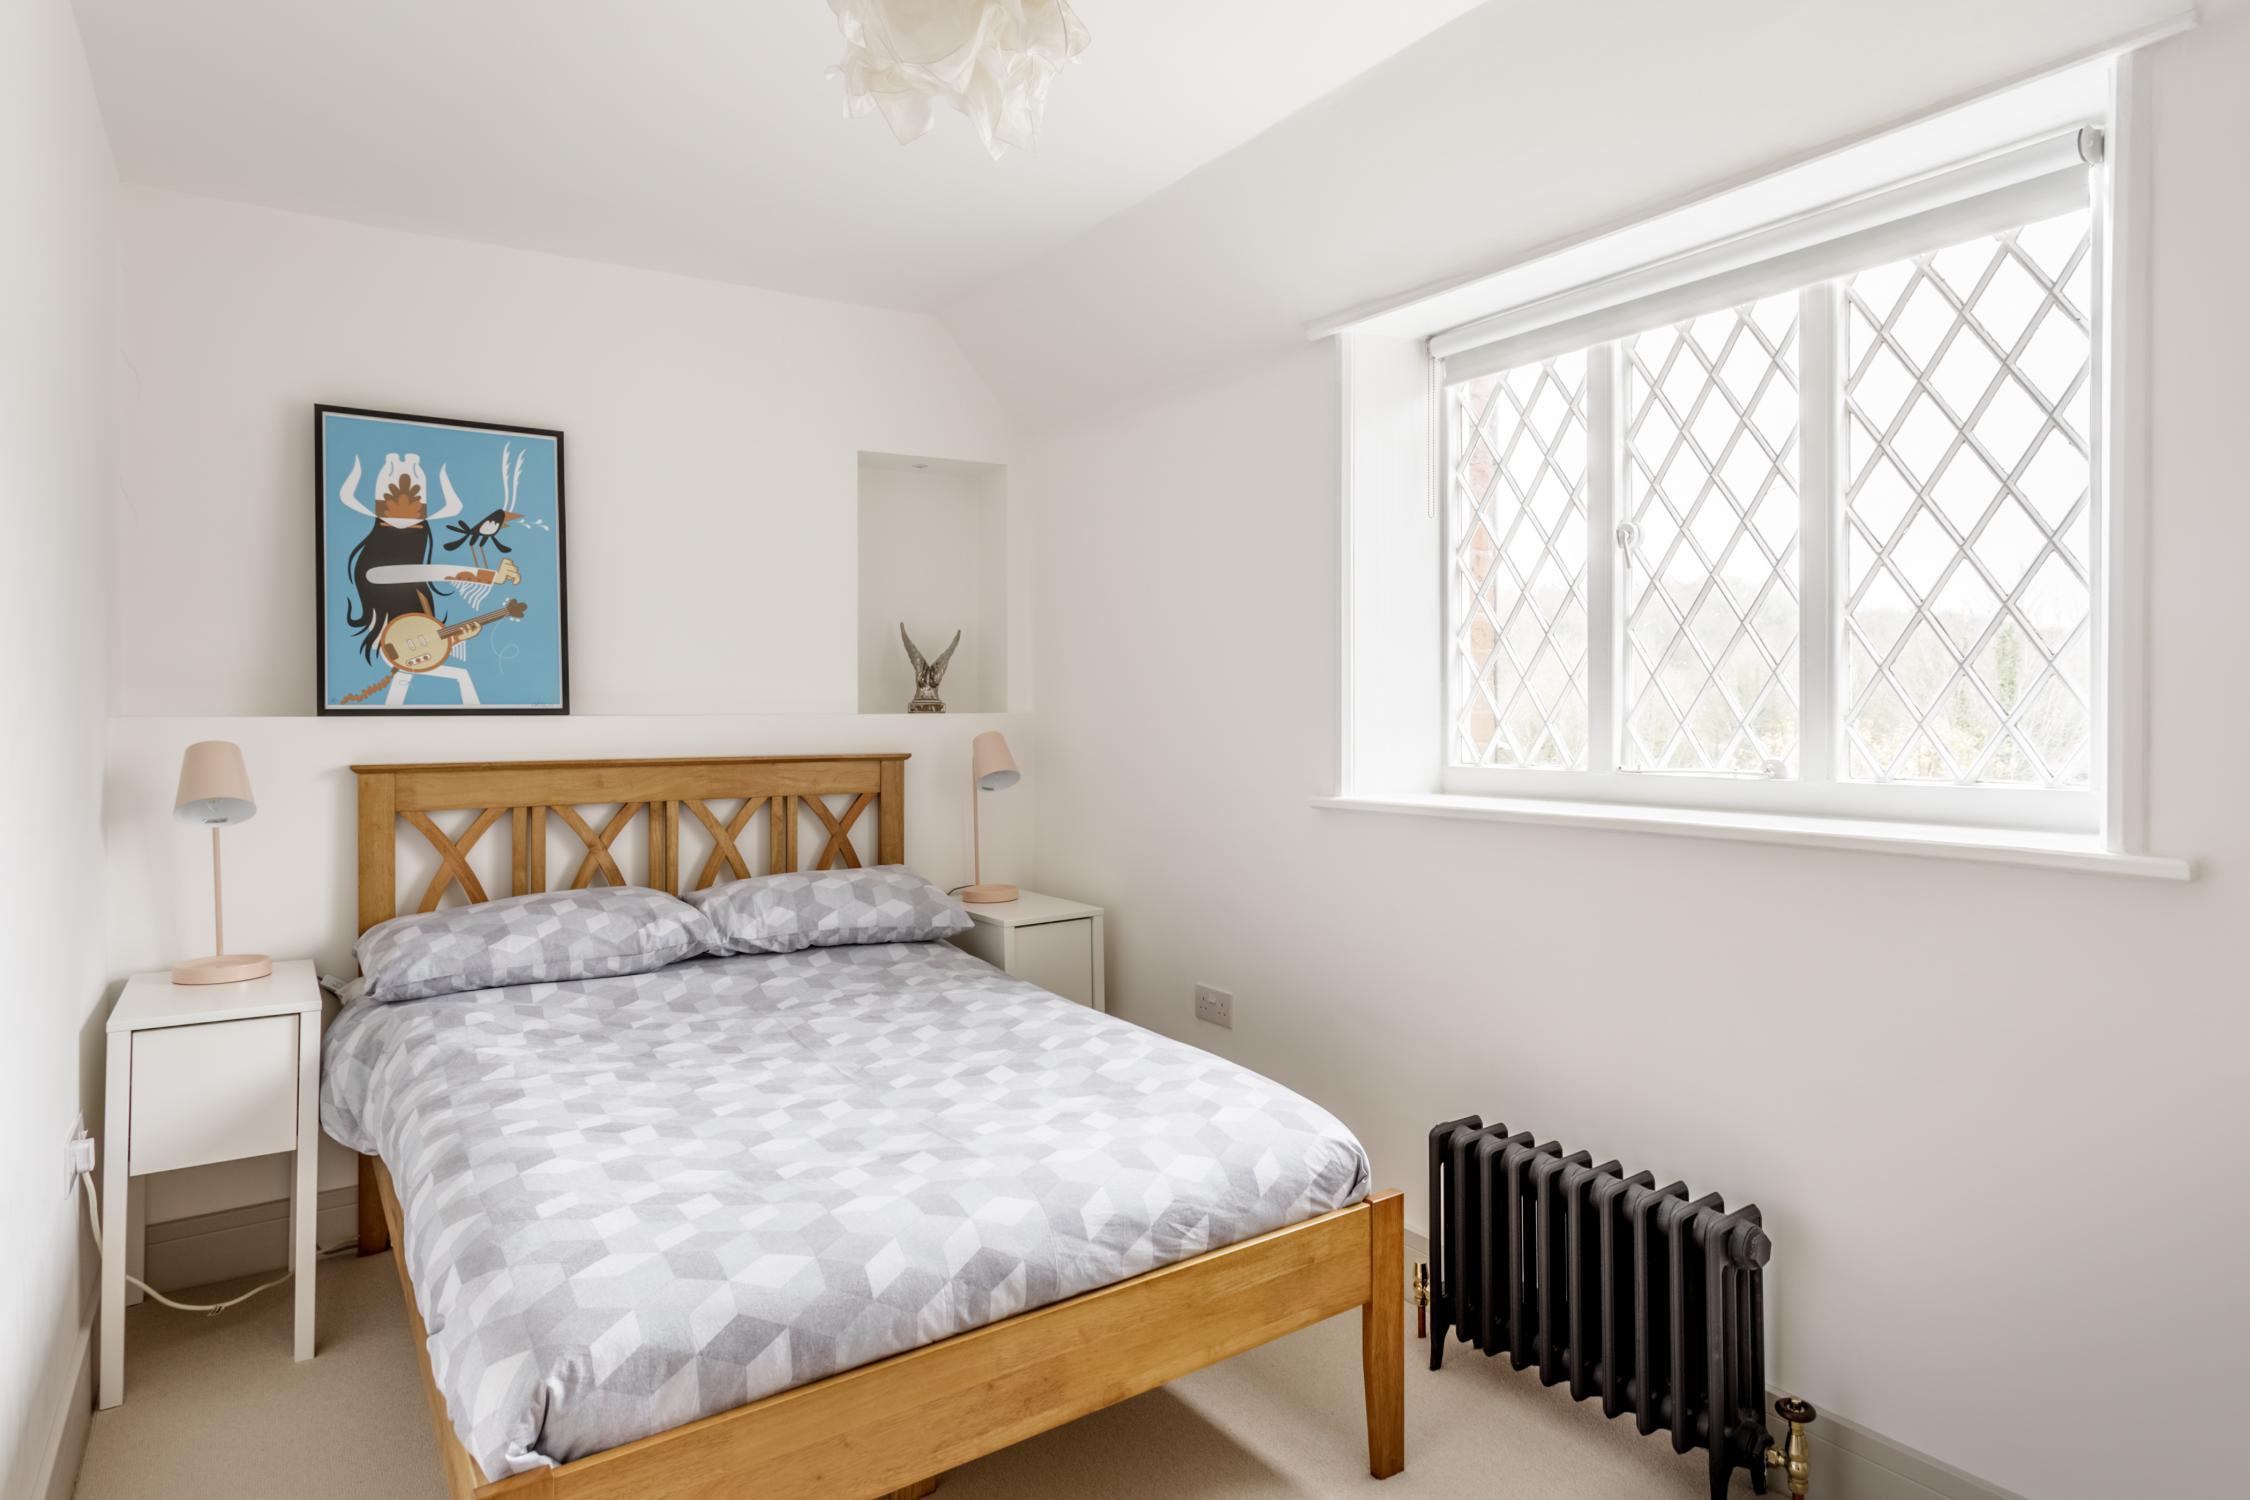 Worthing Builders-ExtraOrdinaryRooms-Arundel renovation clever bedroom design.jpg